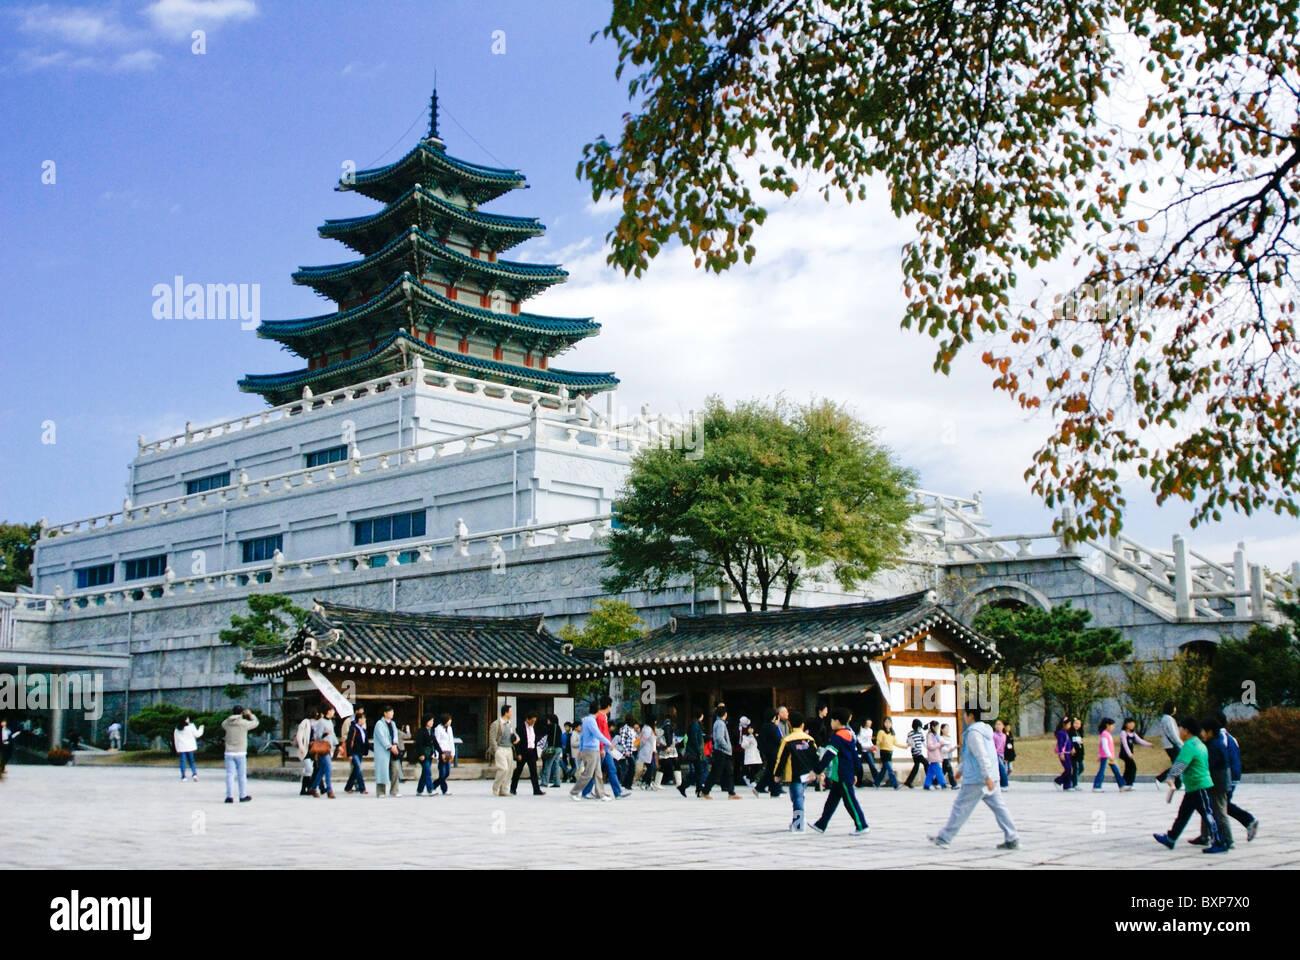 National Folk Museum, Seoul, South Korea - Stock Image